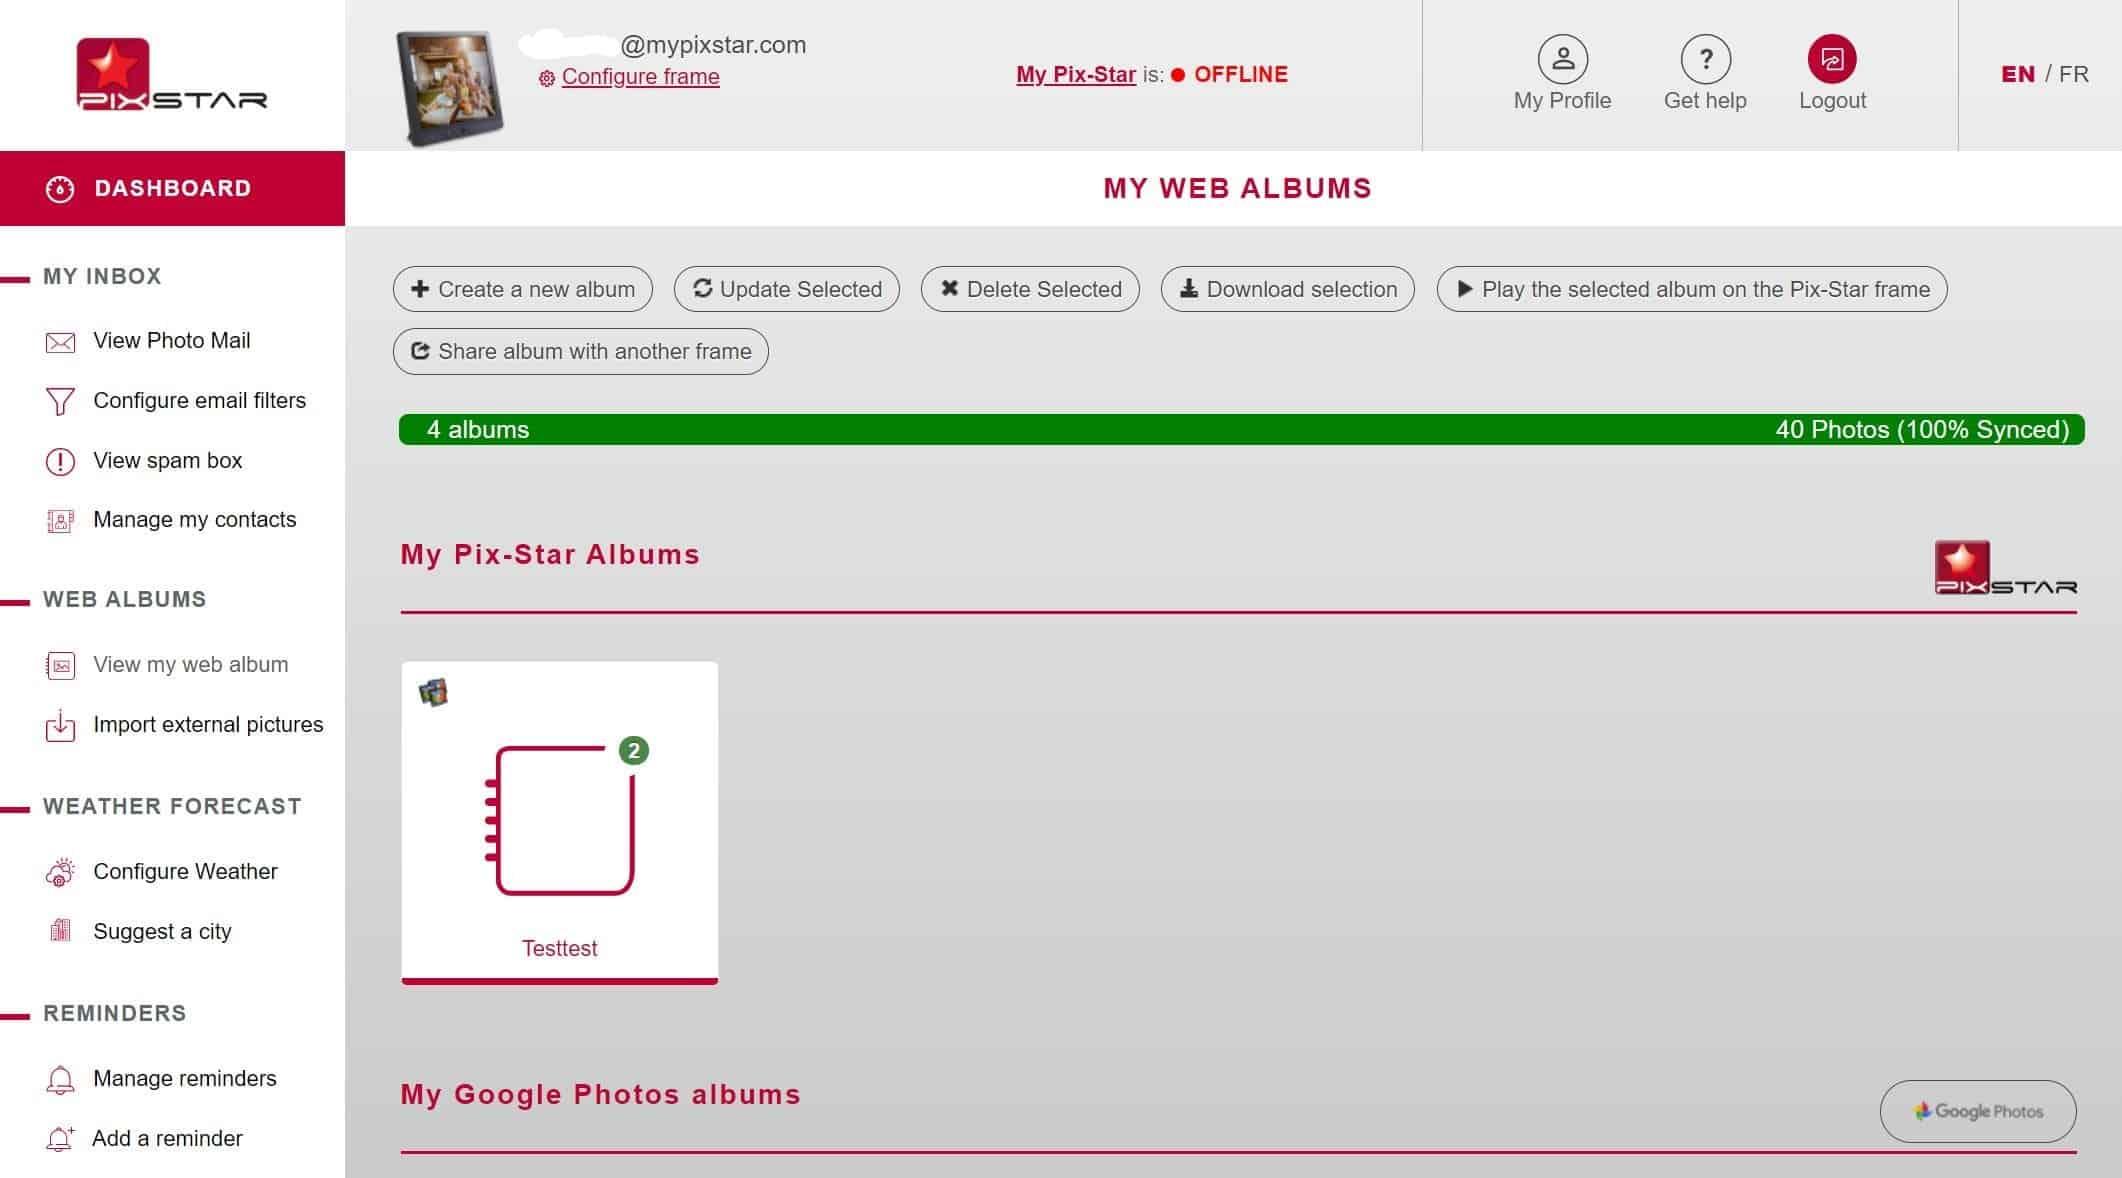 Pix-Star dashboard web album view